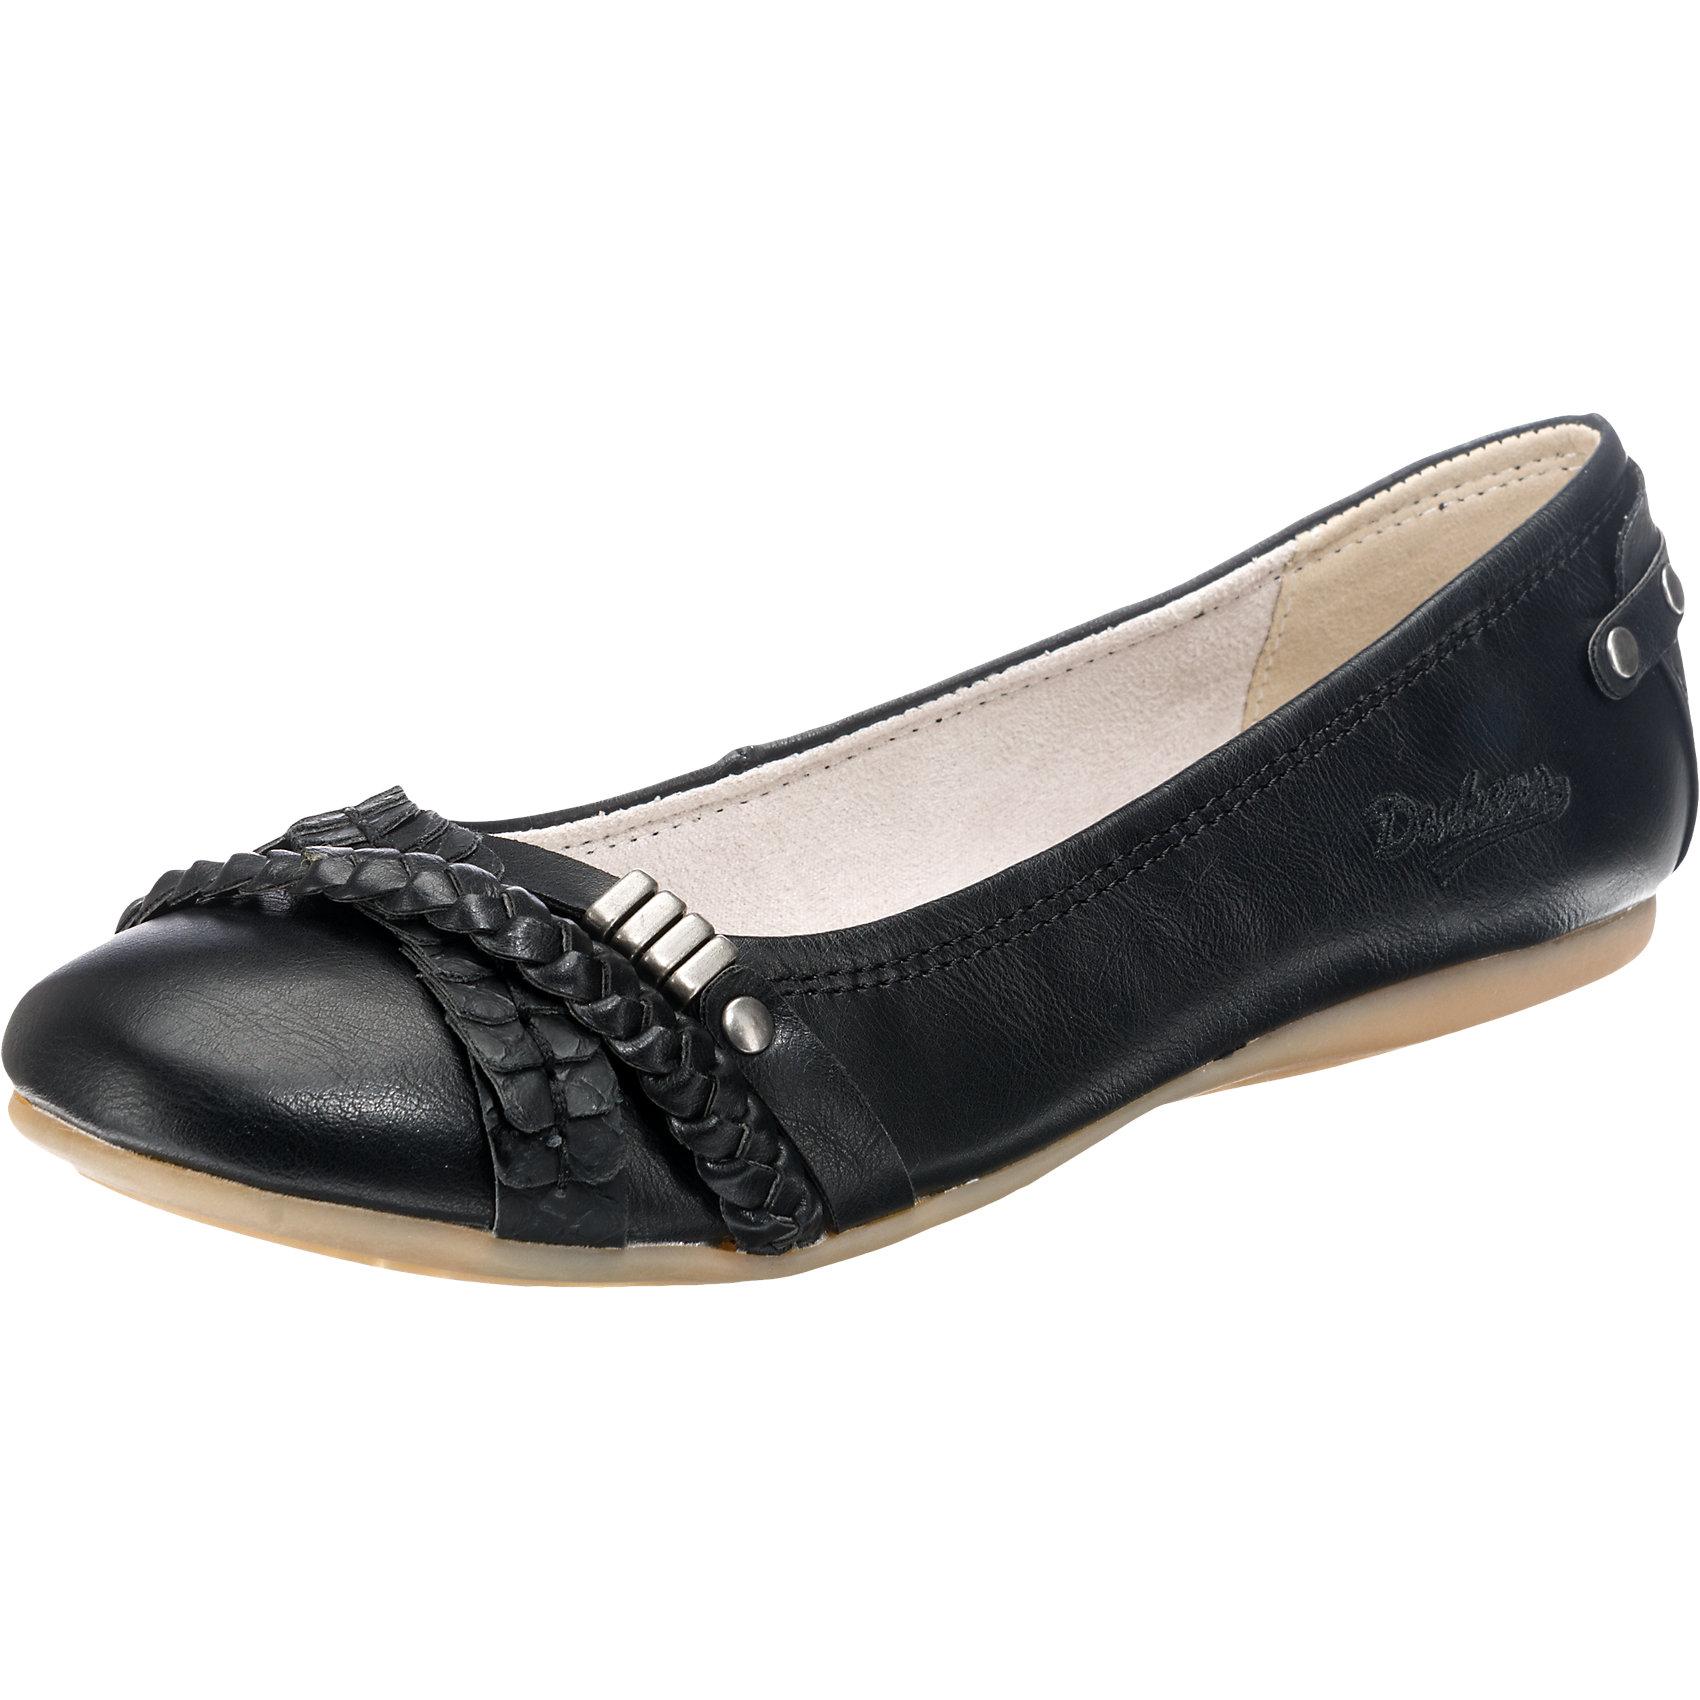 Details zu Neu Dockers by Gerli 34JE206 610100 Ballerinas schwarz 5747994